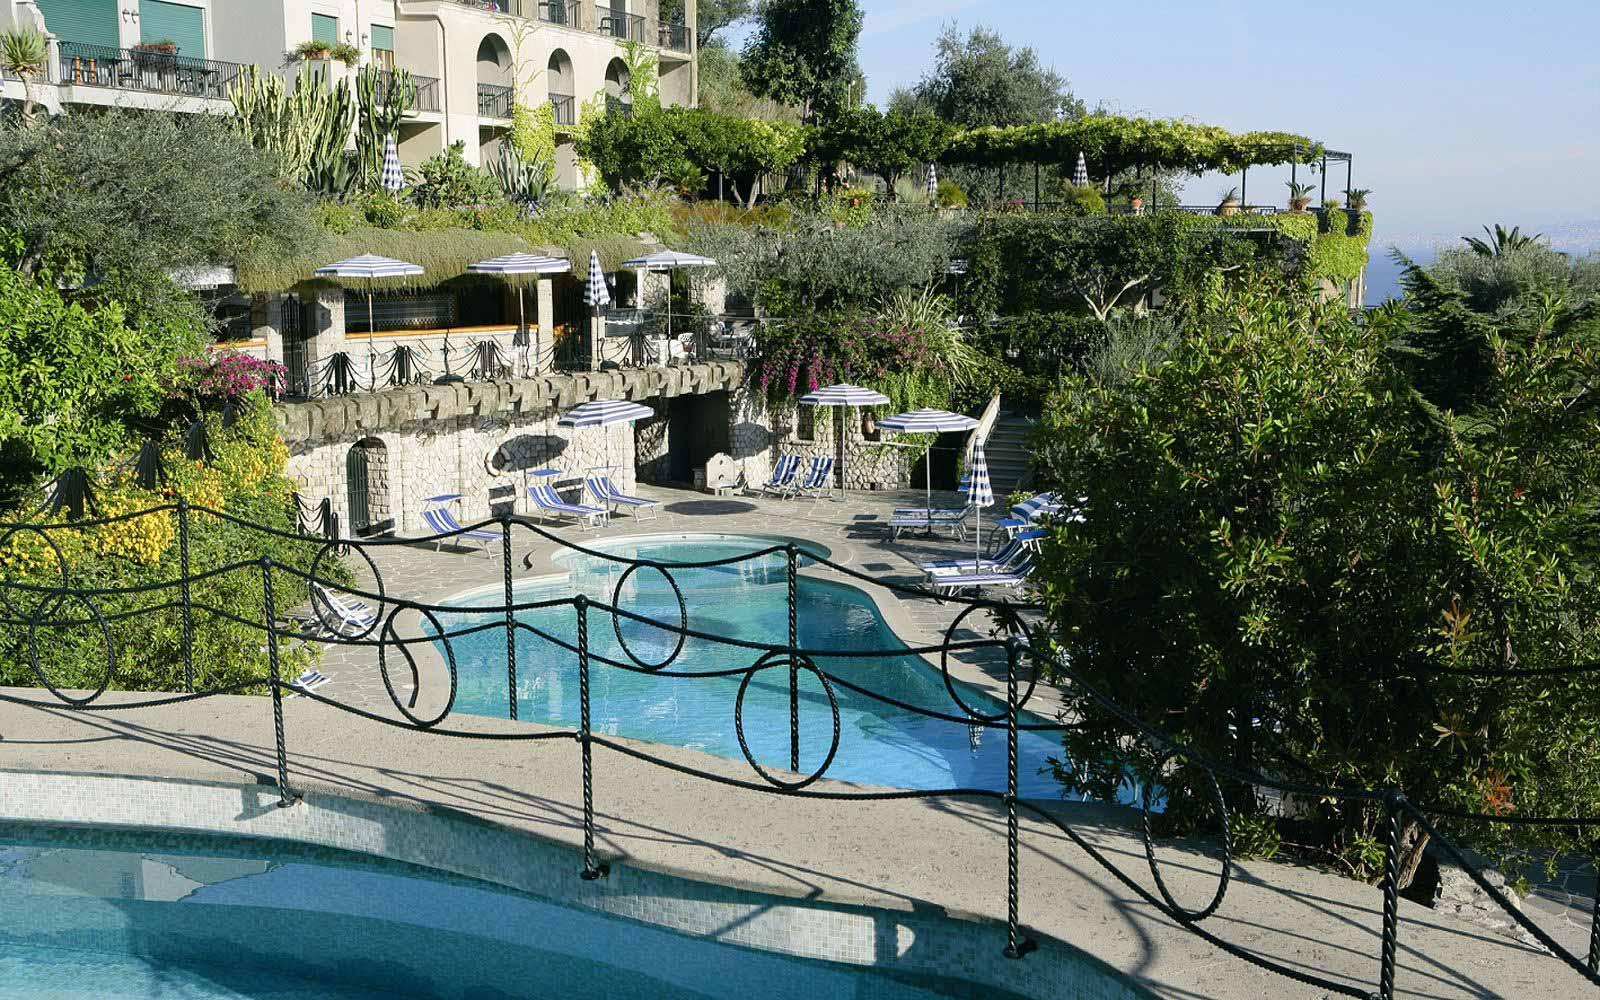 Pool Bar at the Grand Hotel Capodimonte